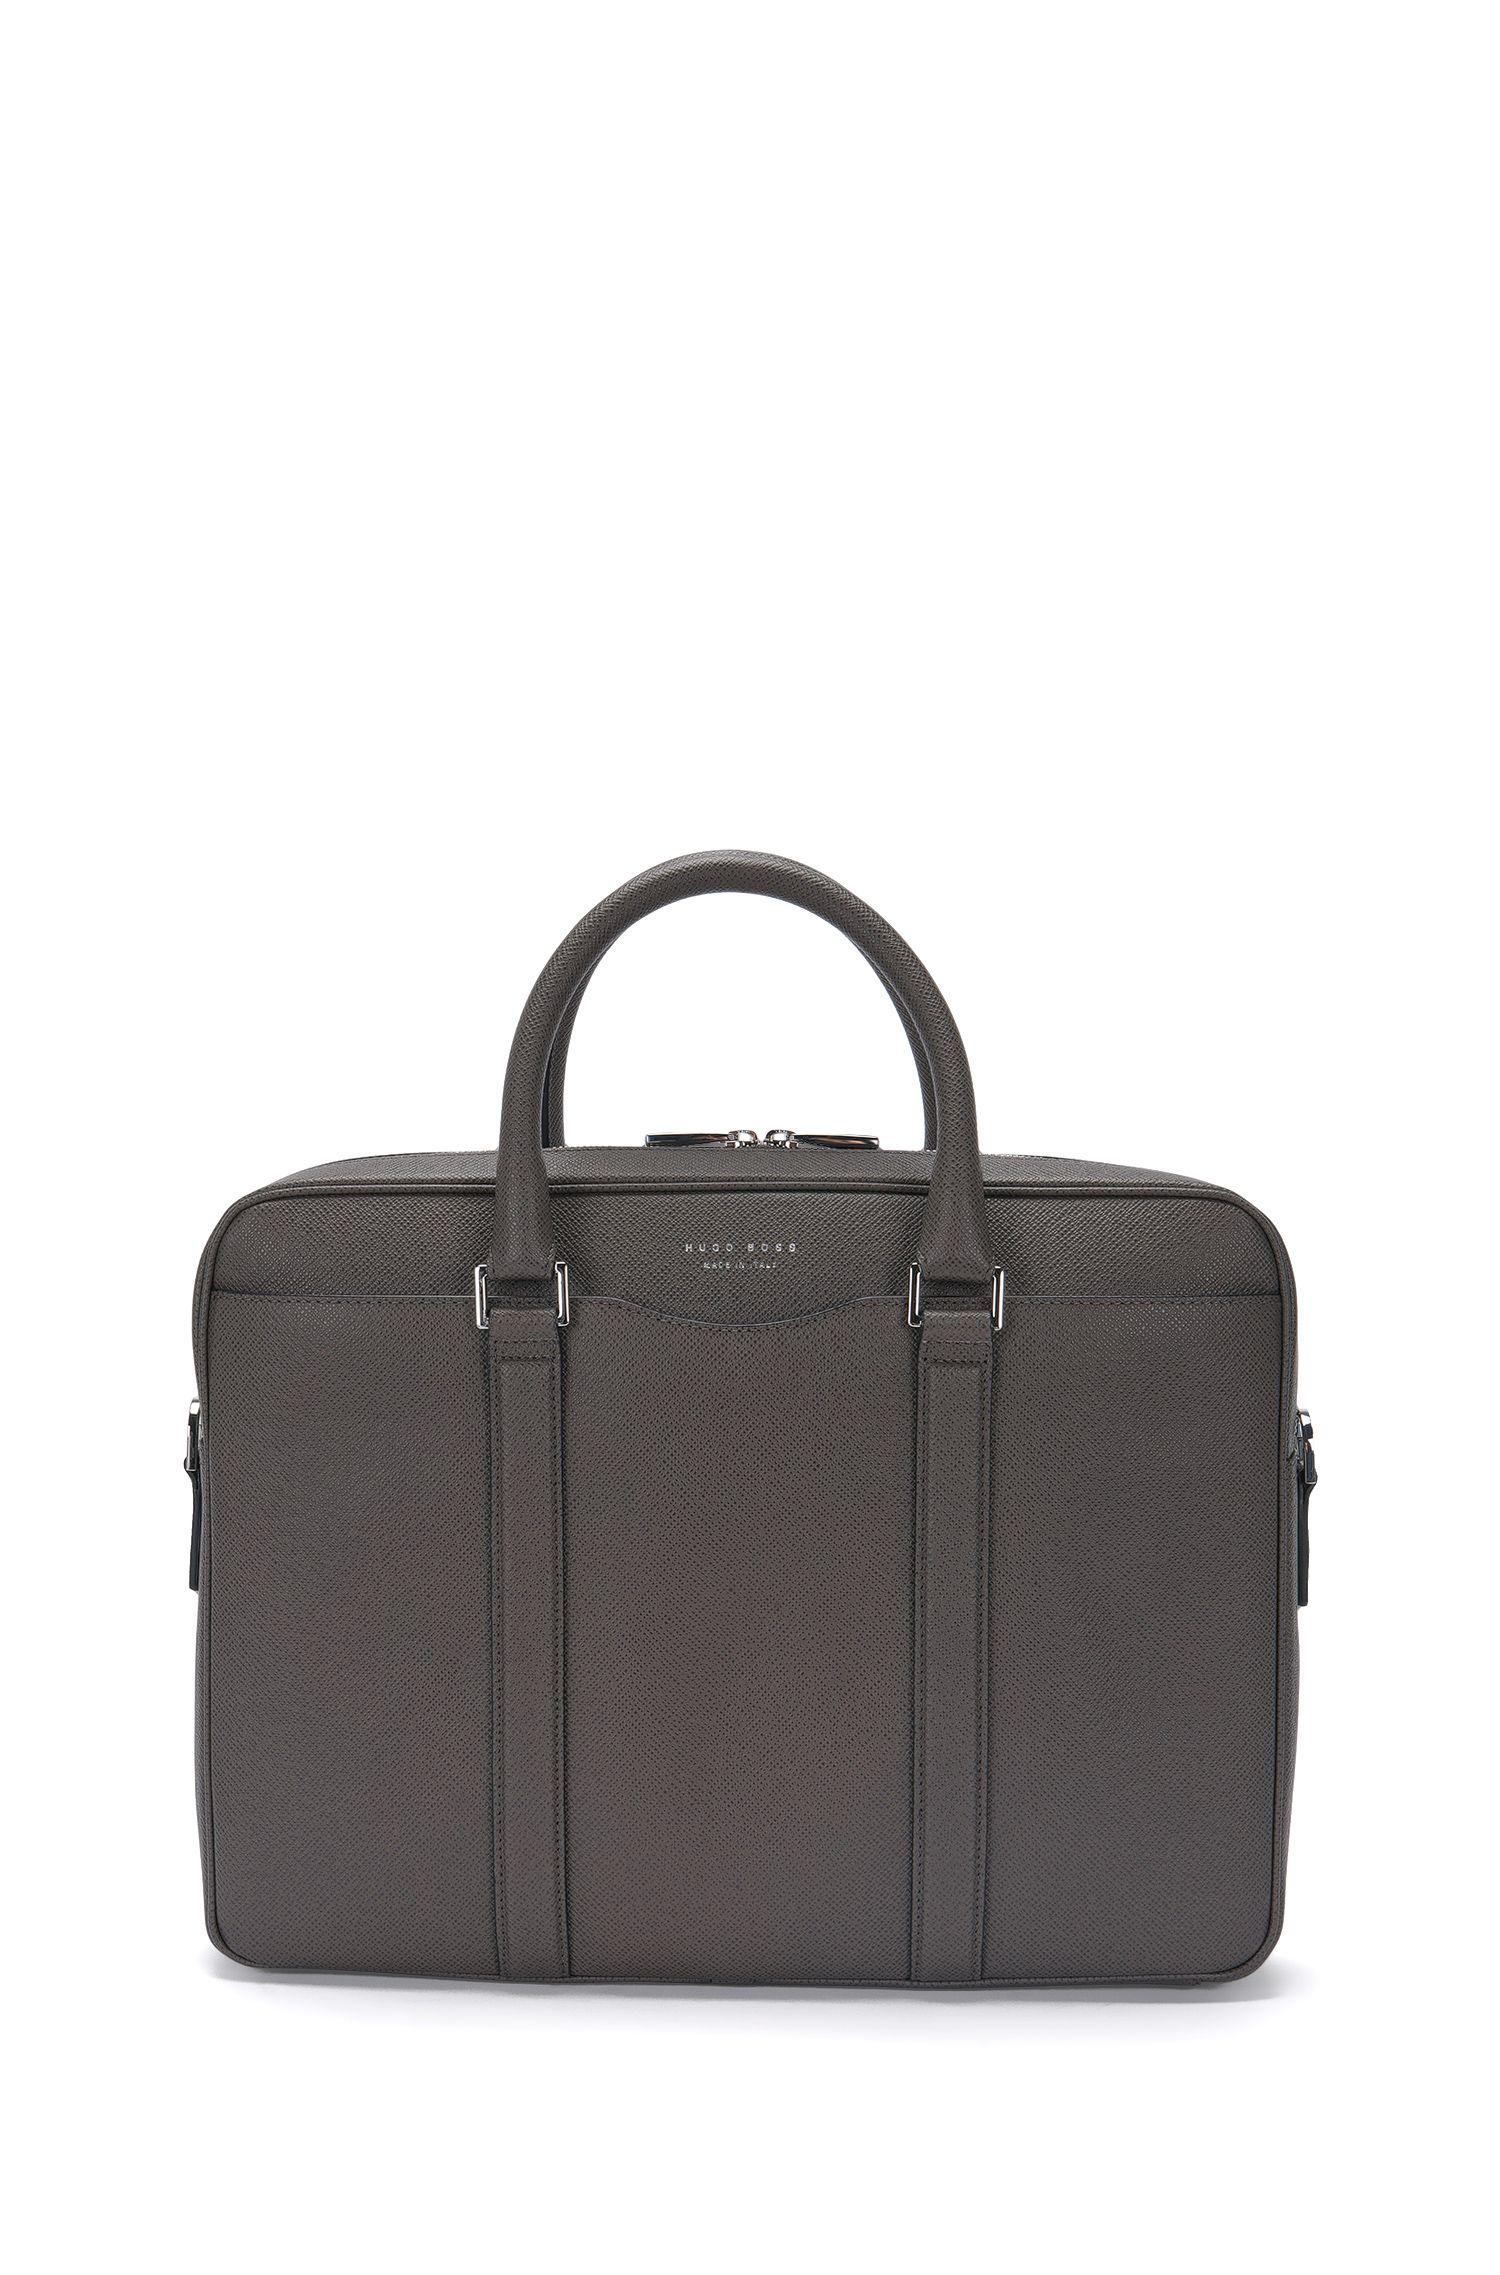 Italian Calfskin Workbag | Signature S Doc